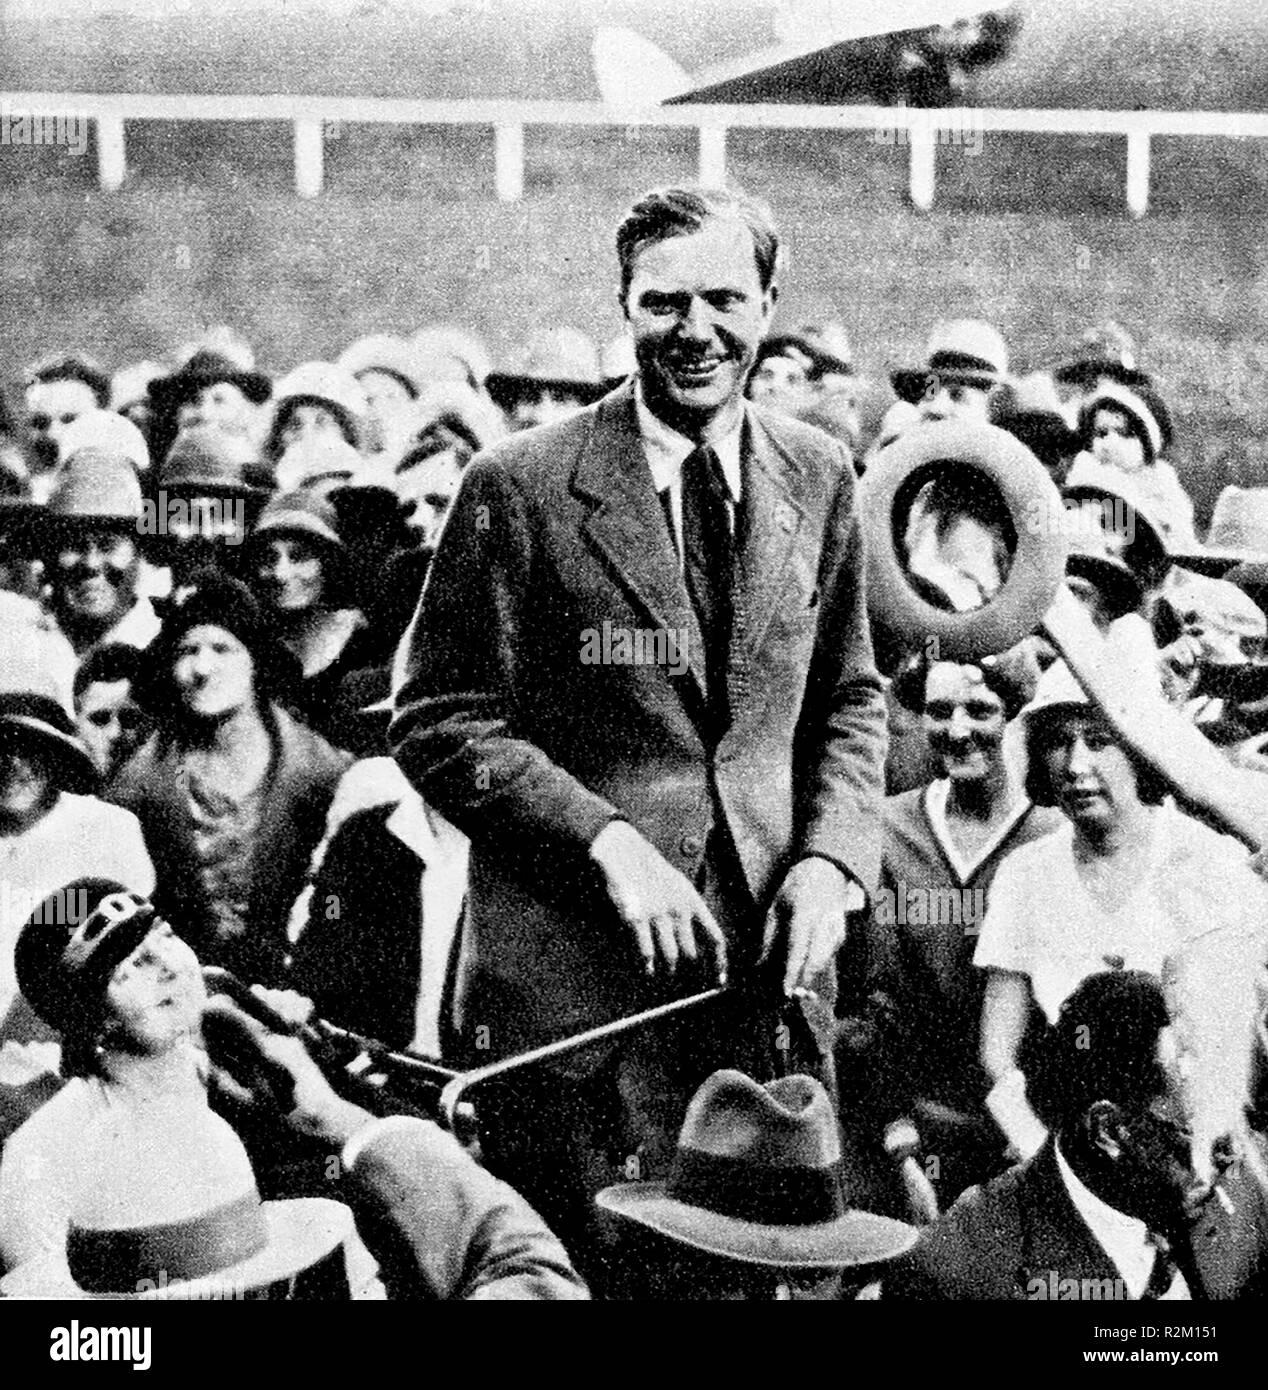 October 1934 Mildenhall England to Australia air race - Winner  C.W.A. Scott (2 days,22 hrs, 55 mins) - Stock Image